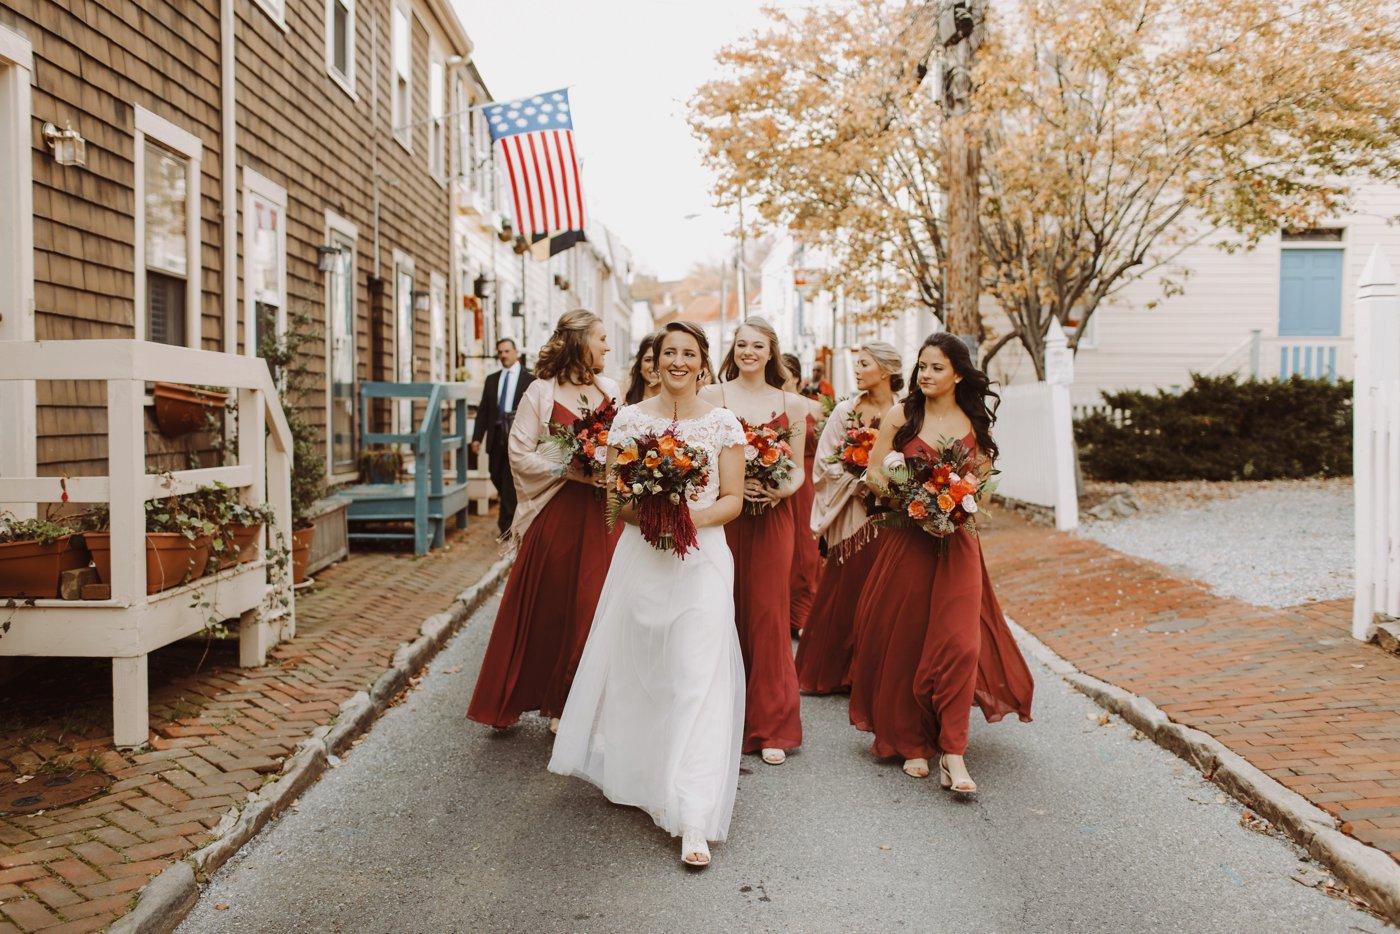 Downtown Annapolis USNA wedding bridesmaids Annapolis wedding photographer